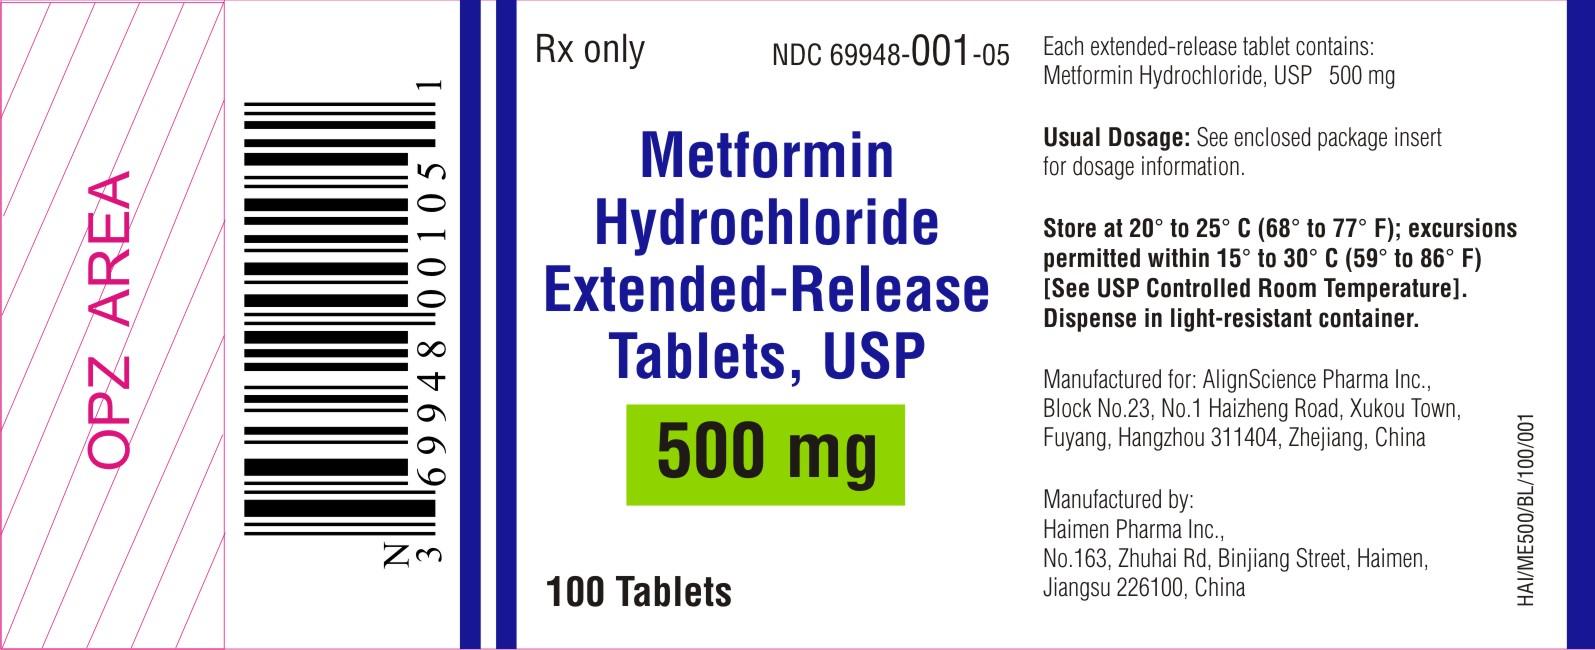 Metformin Hydrochloride (Metformin Hydrochloride)